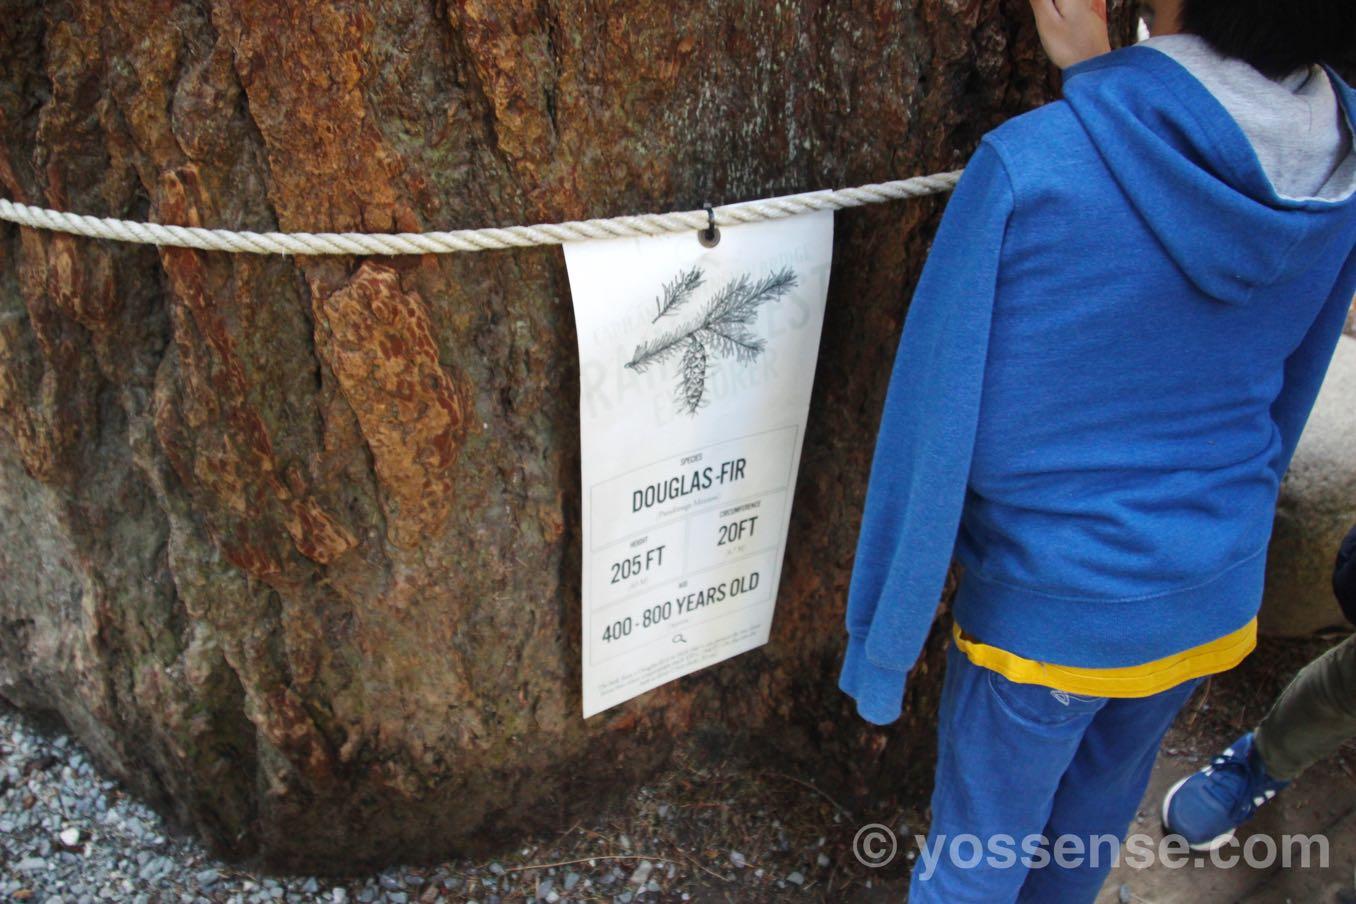 douglas fir(ベイマツ)